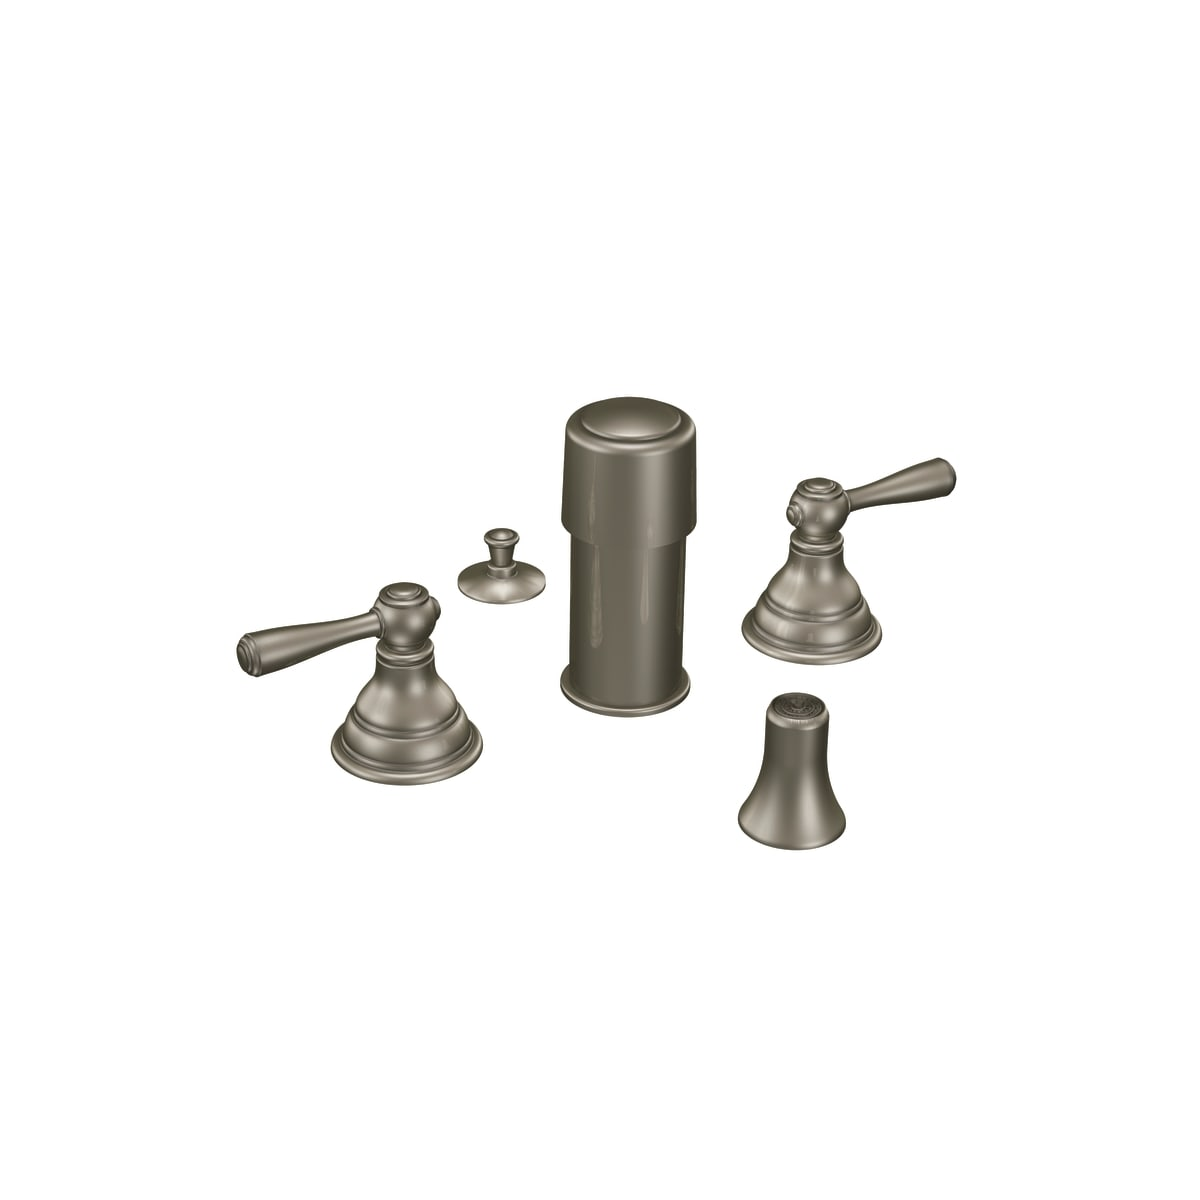 Brushed Nickel valve not included Moen T5210BN Kingsley two-handle bidet faucet